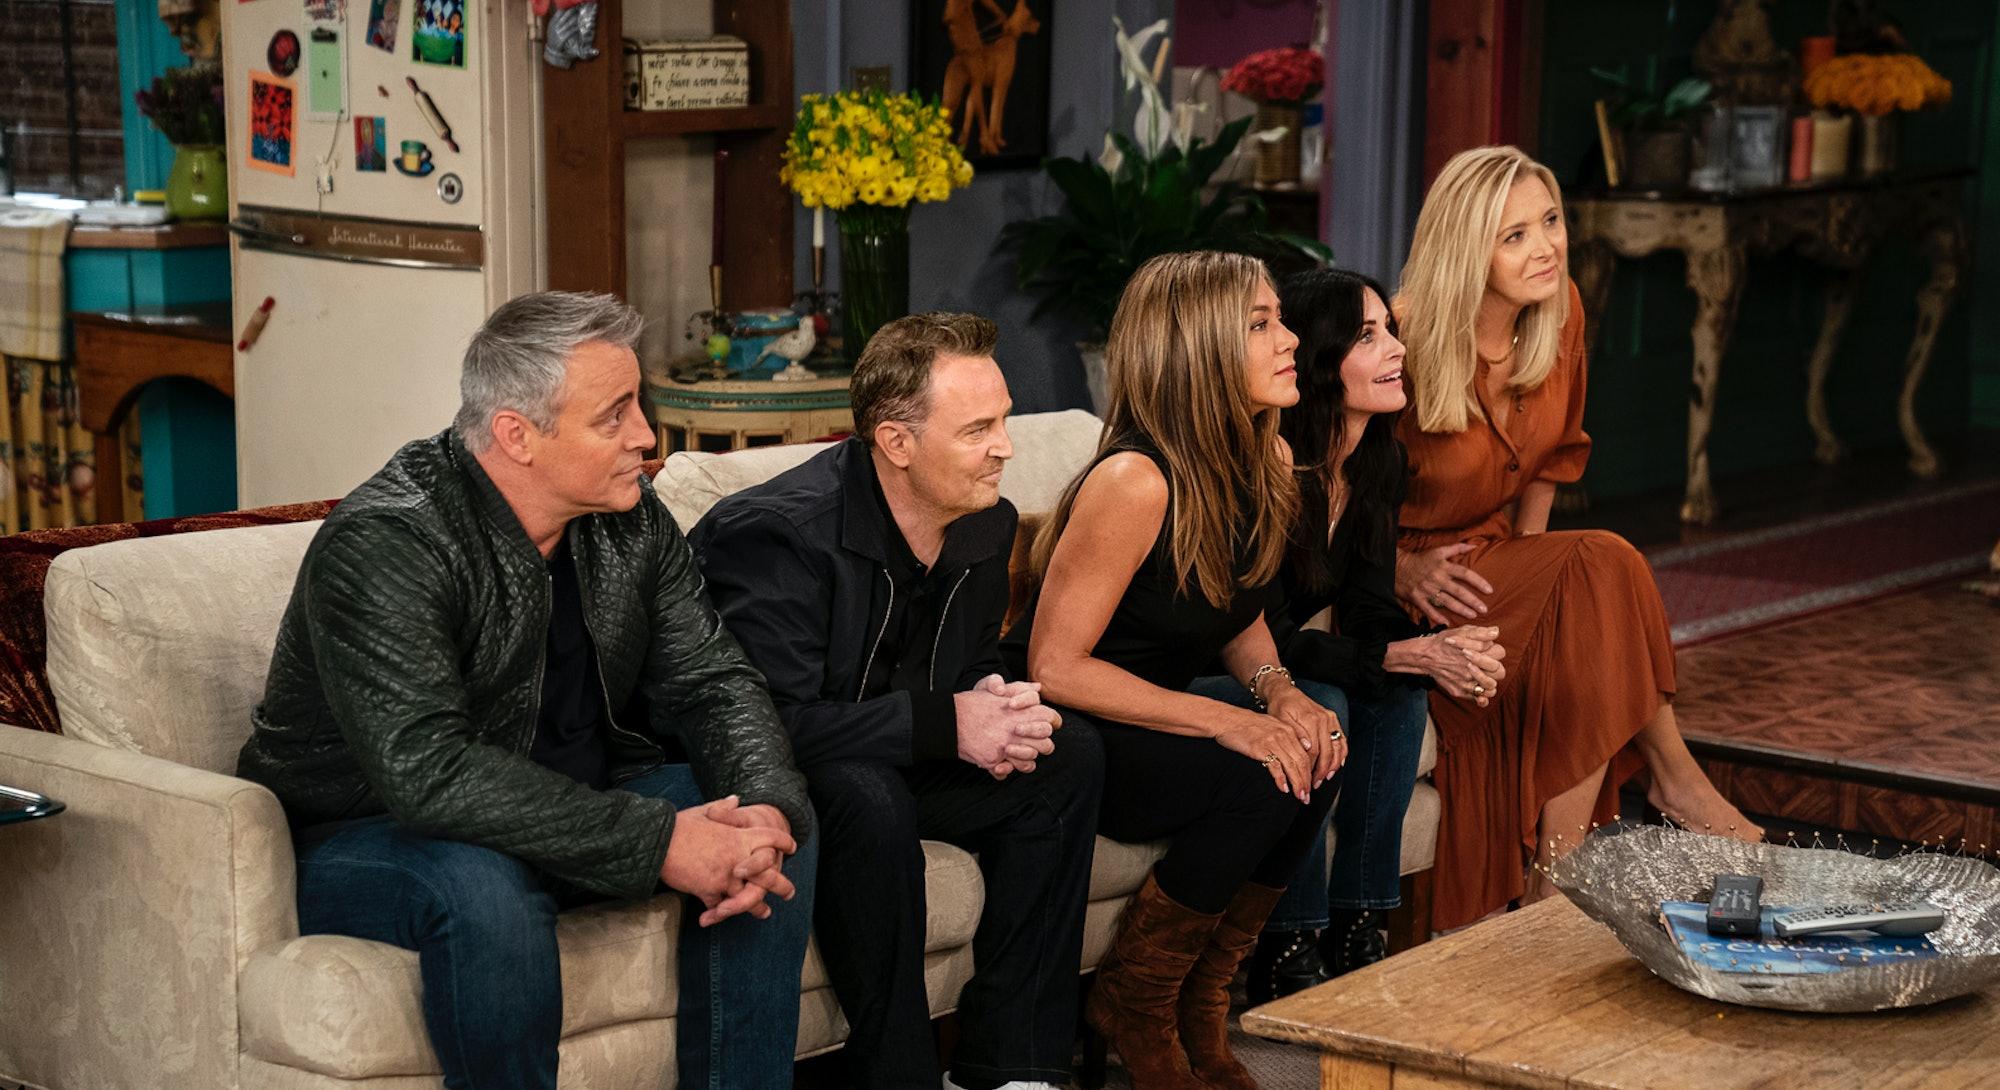 Matt LeBlanc, Matthew Perry, Jennifer Aniston, Courteney Cox and Lisa Kudrow in 'Friends: The Reunion' via HBO Max's press site